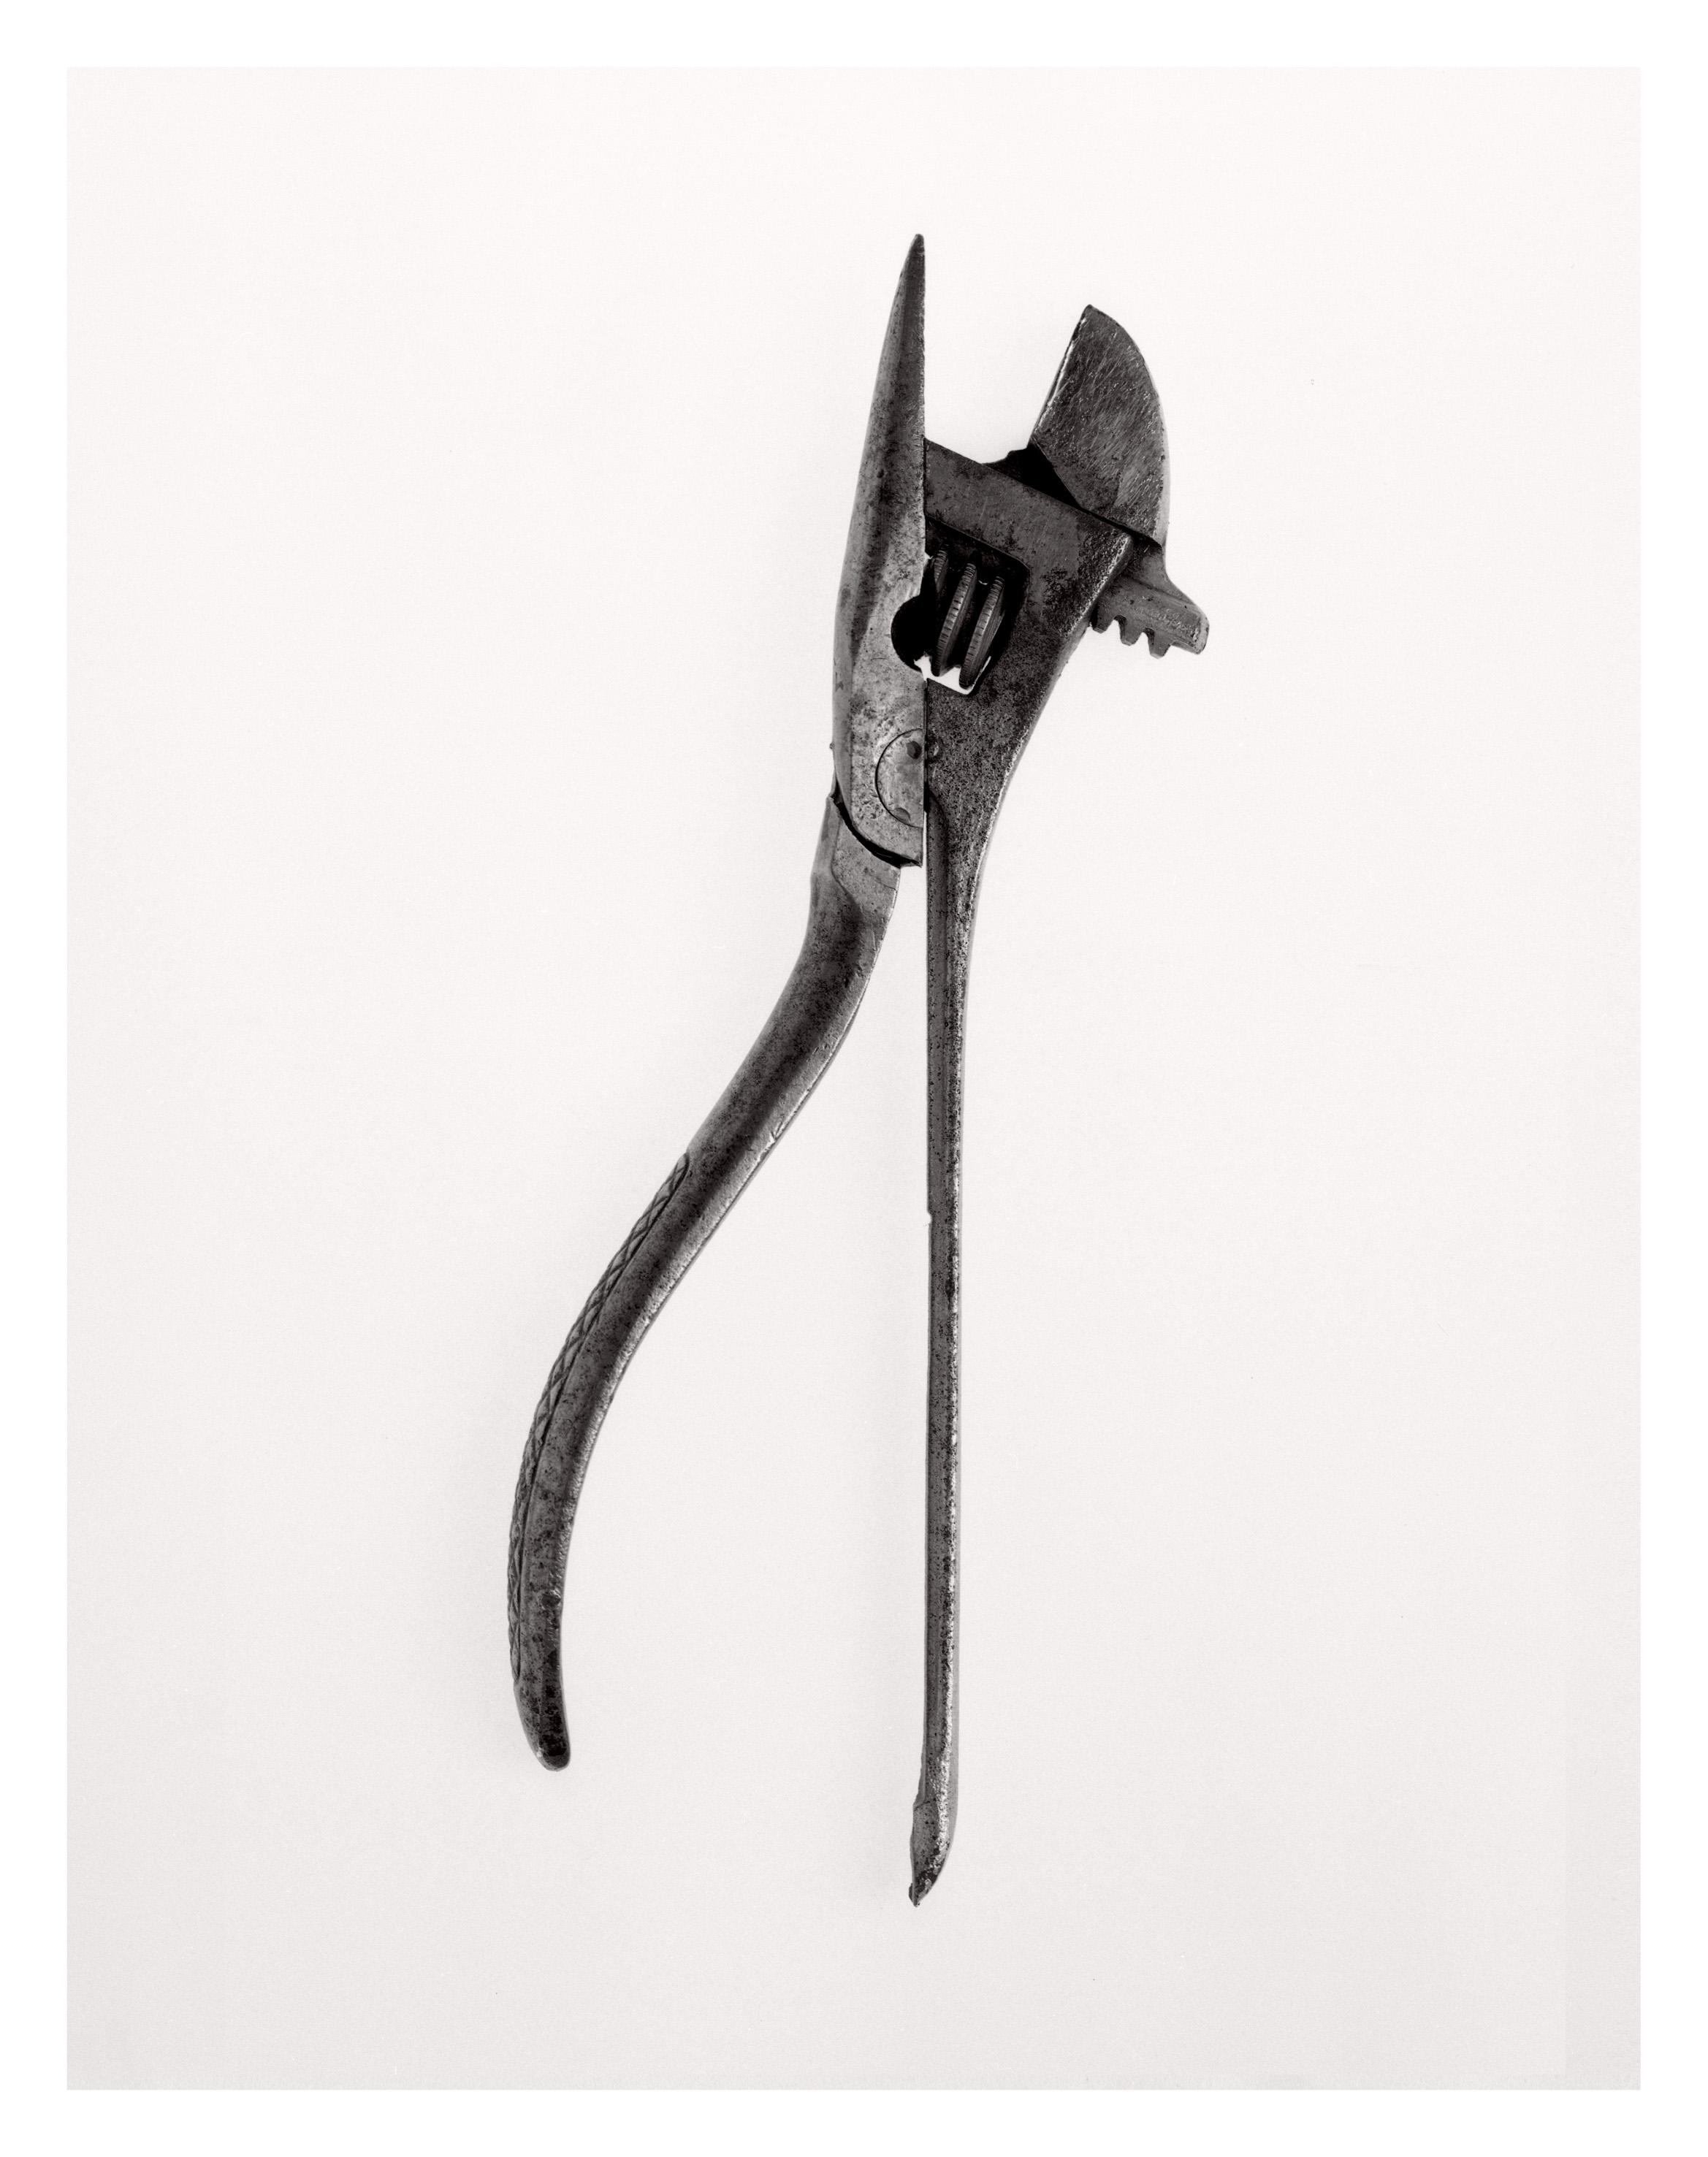 (rephrased) Beauties of the Common Tool, Rephrased 2, Fiber-based handprint, 2013